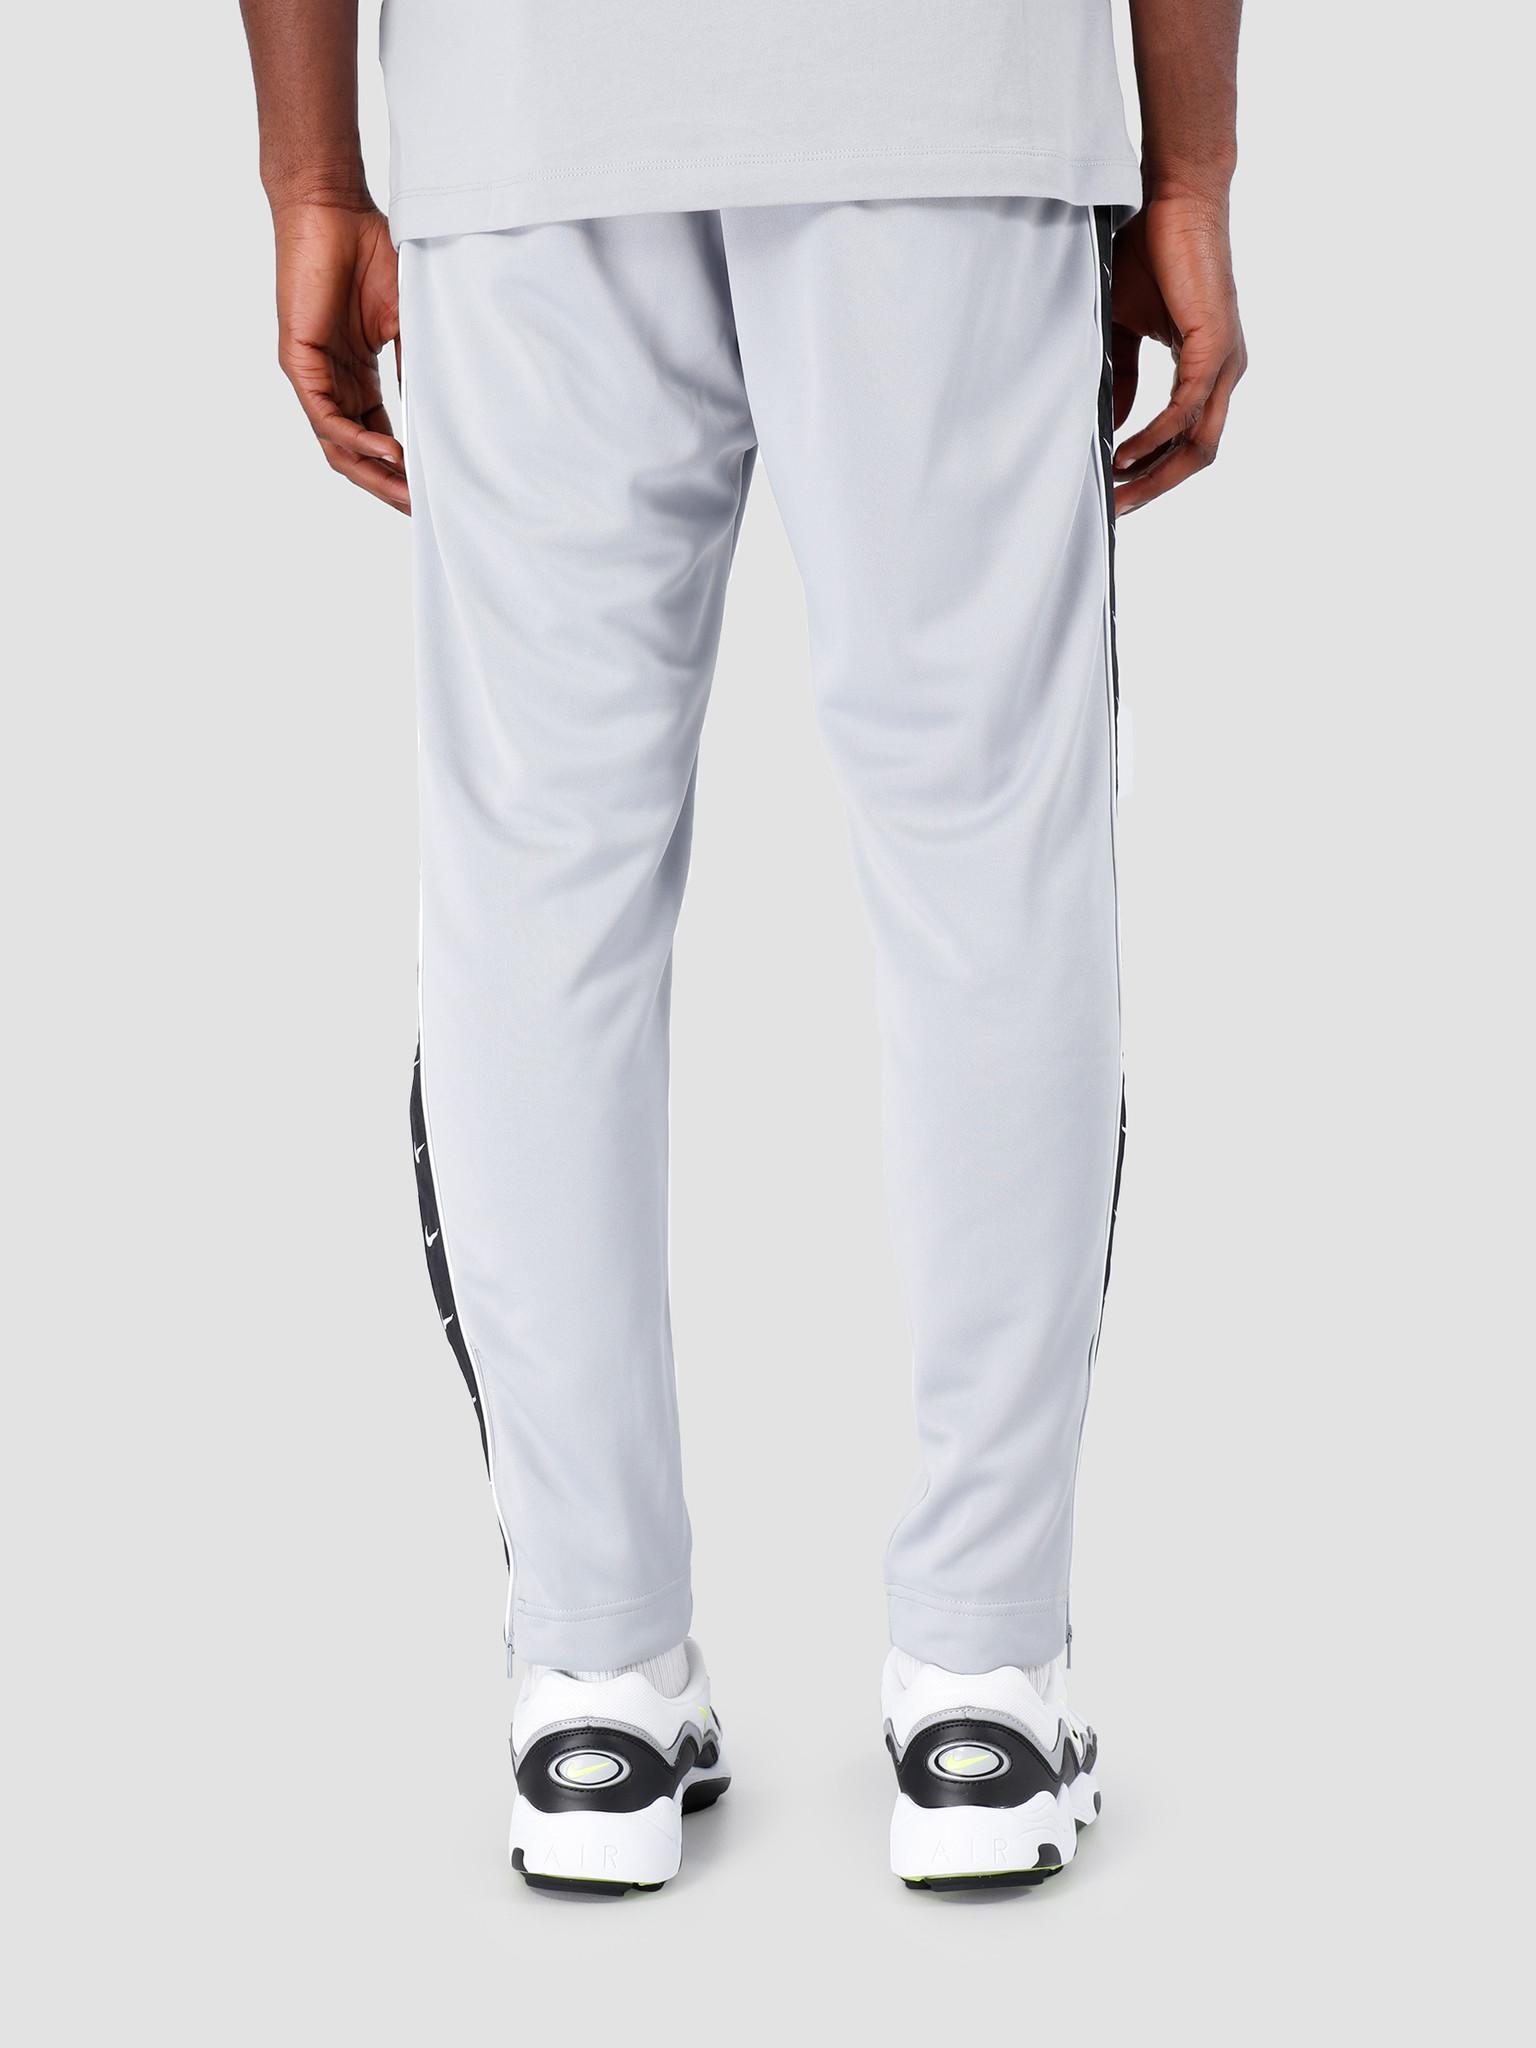 Nike Nike Air Pants Wolf Grey White AR3142-012